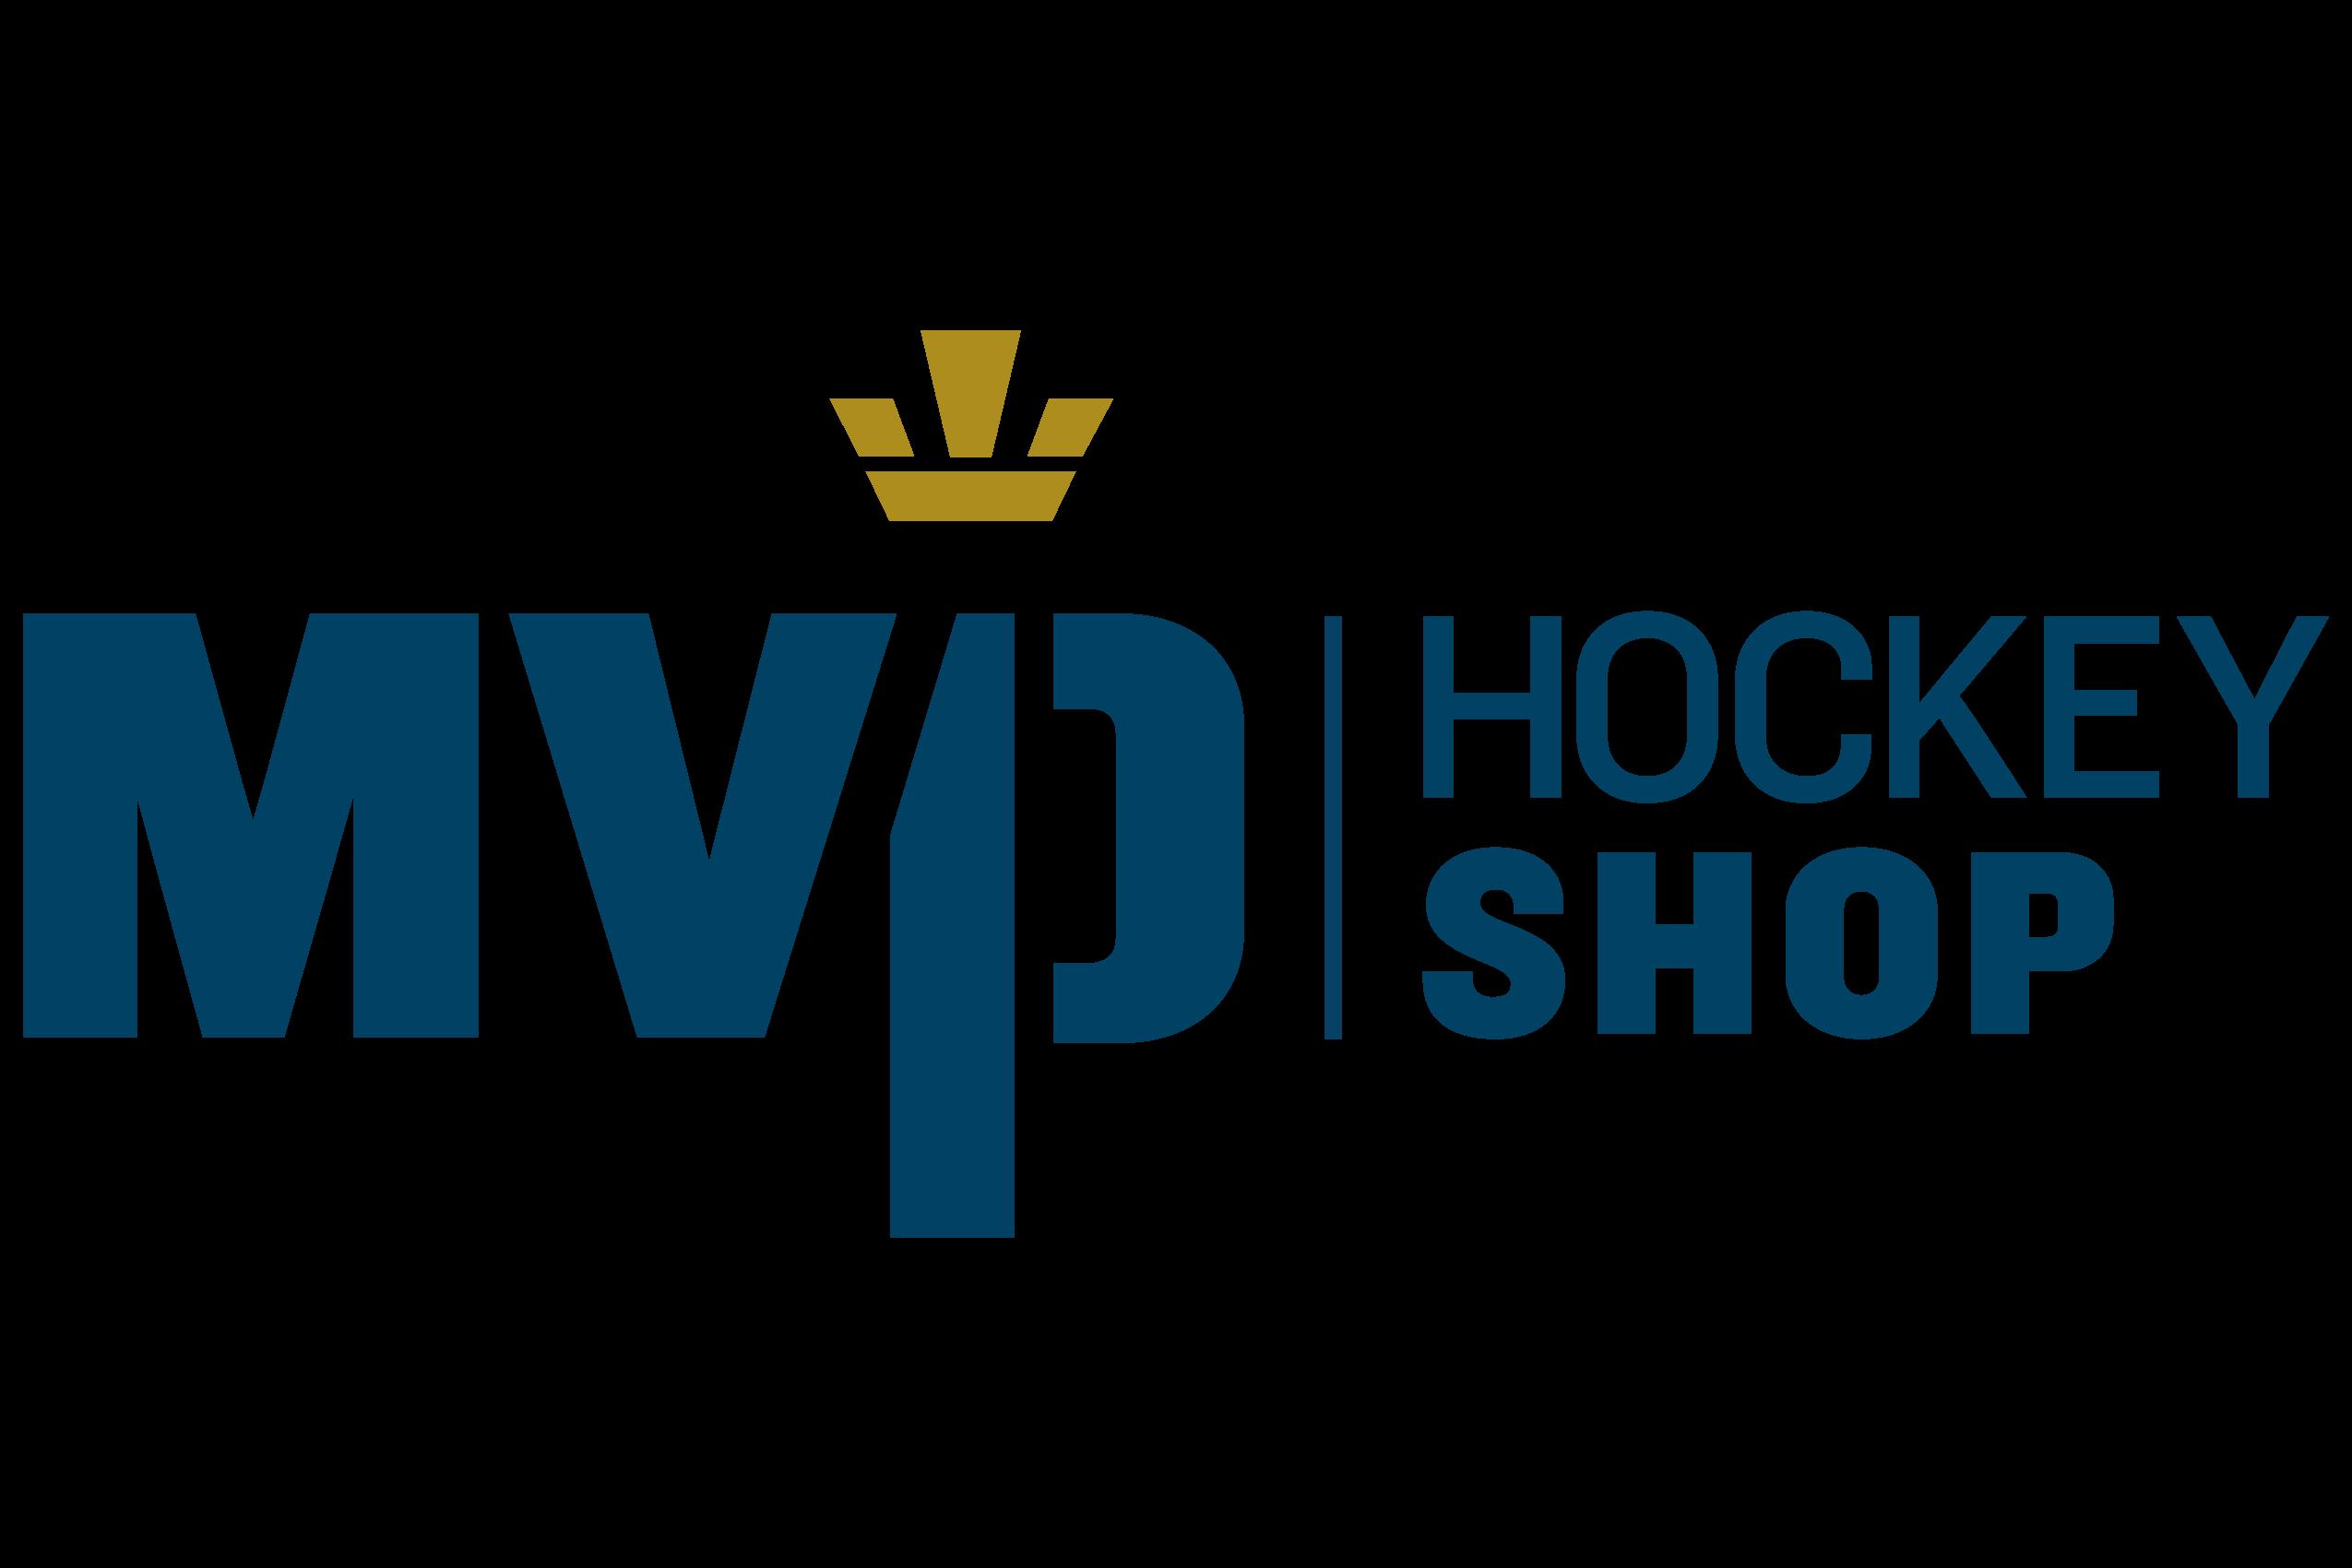 mvp_logo_home